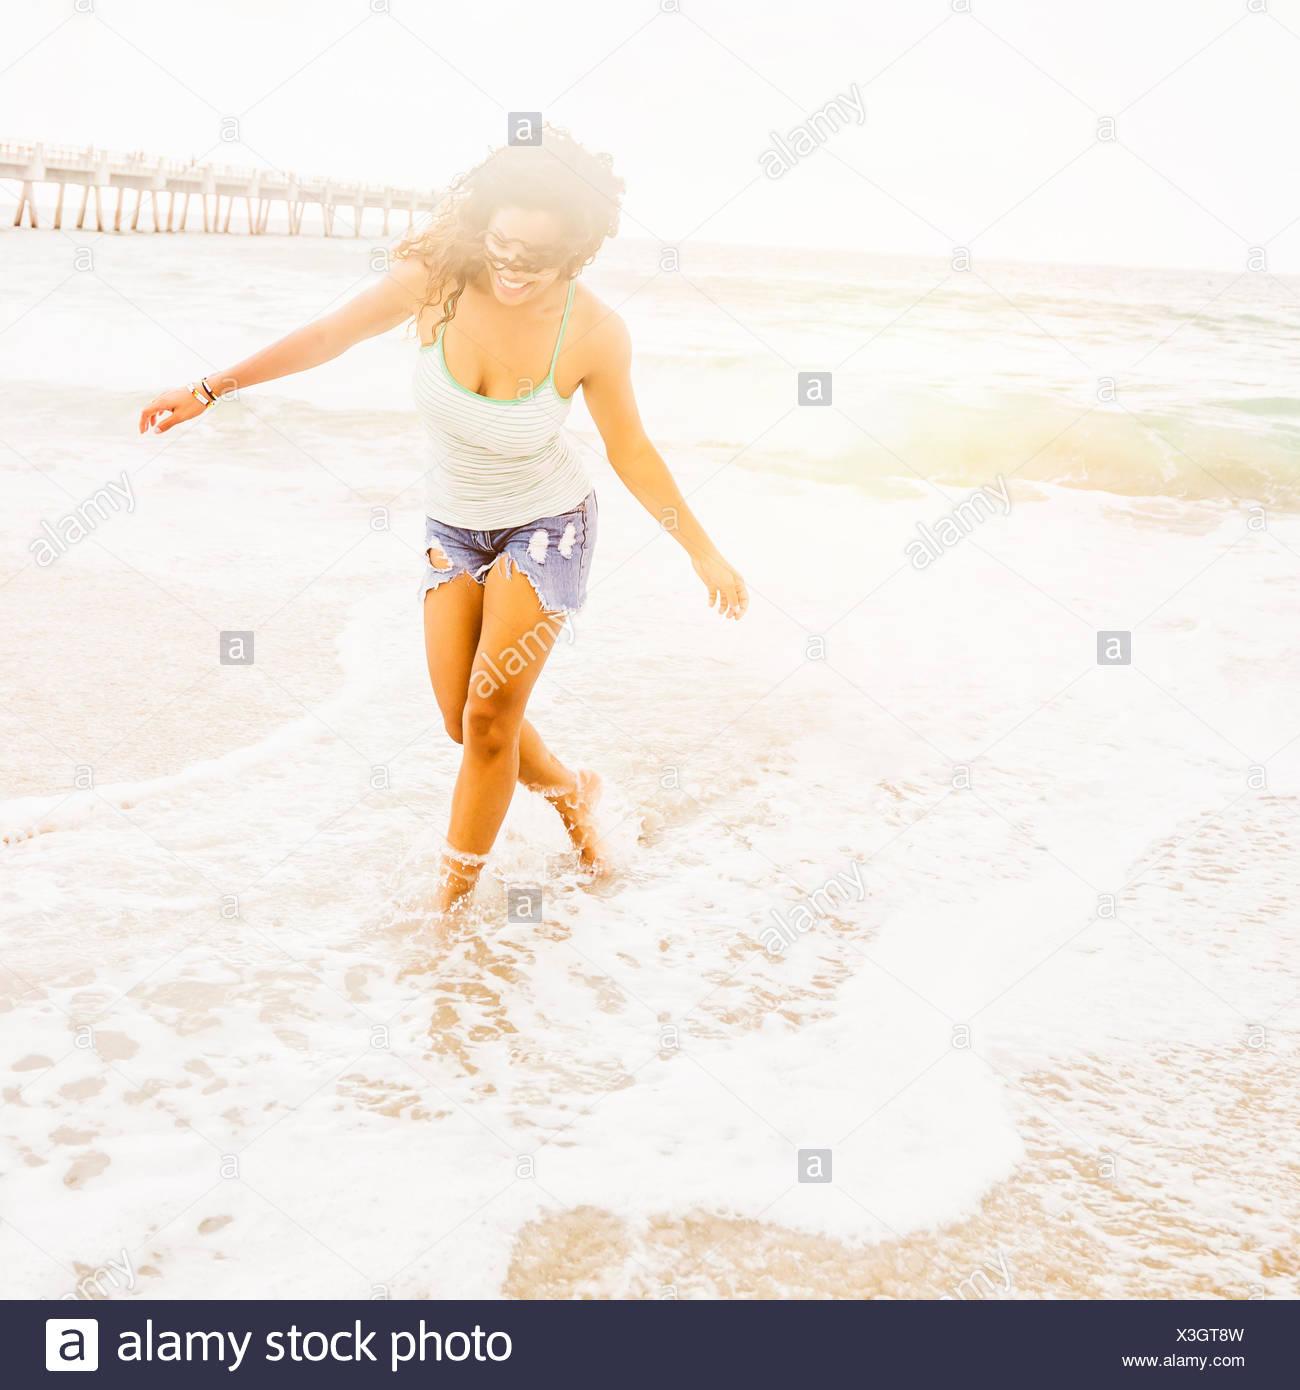 USA, Florida, Jupiter, Portrait of woman standing on beach - Stock Image